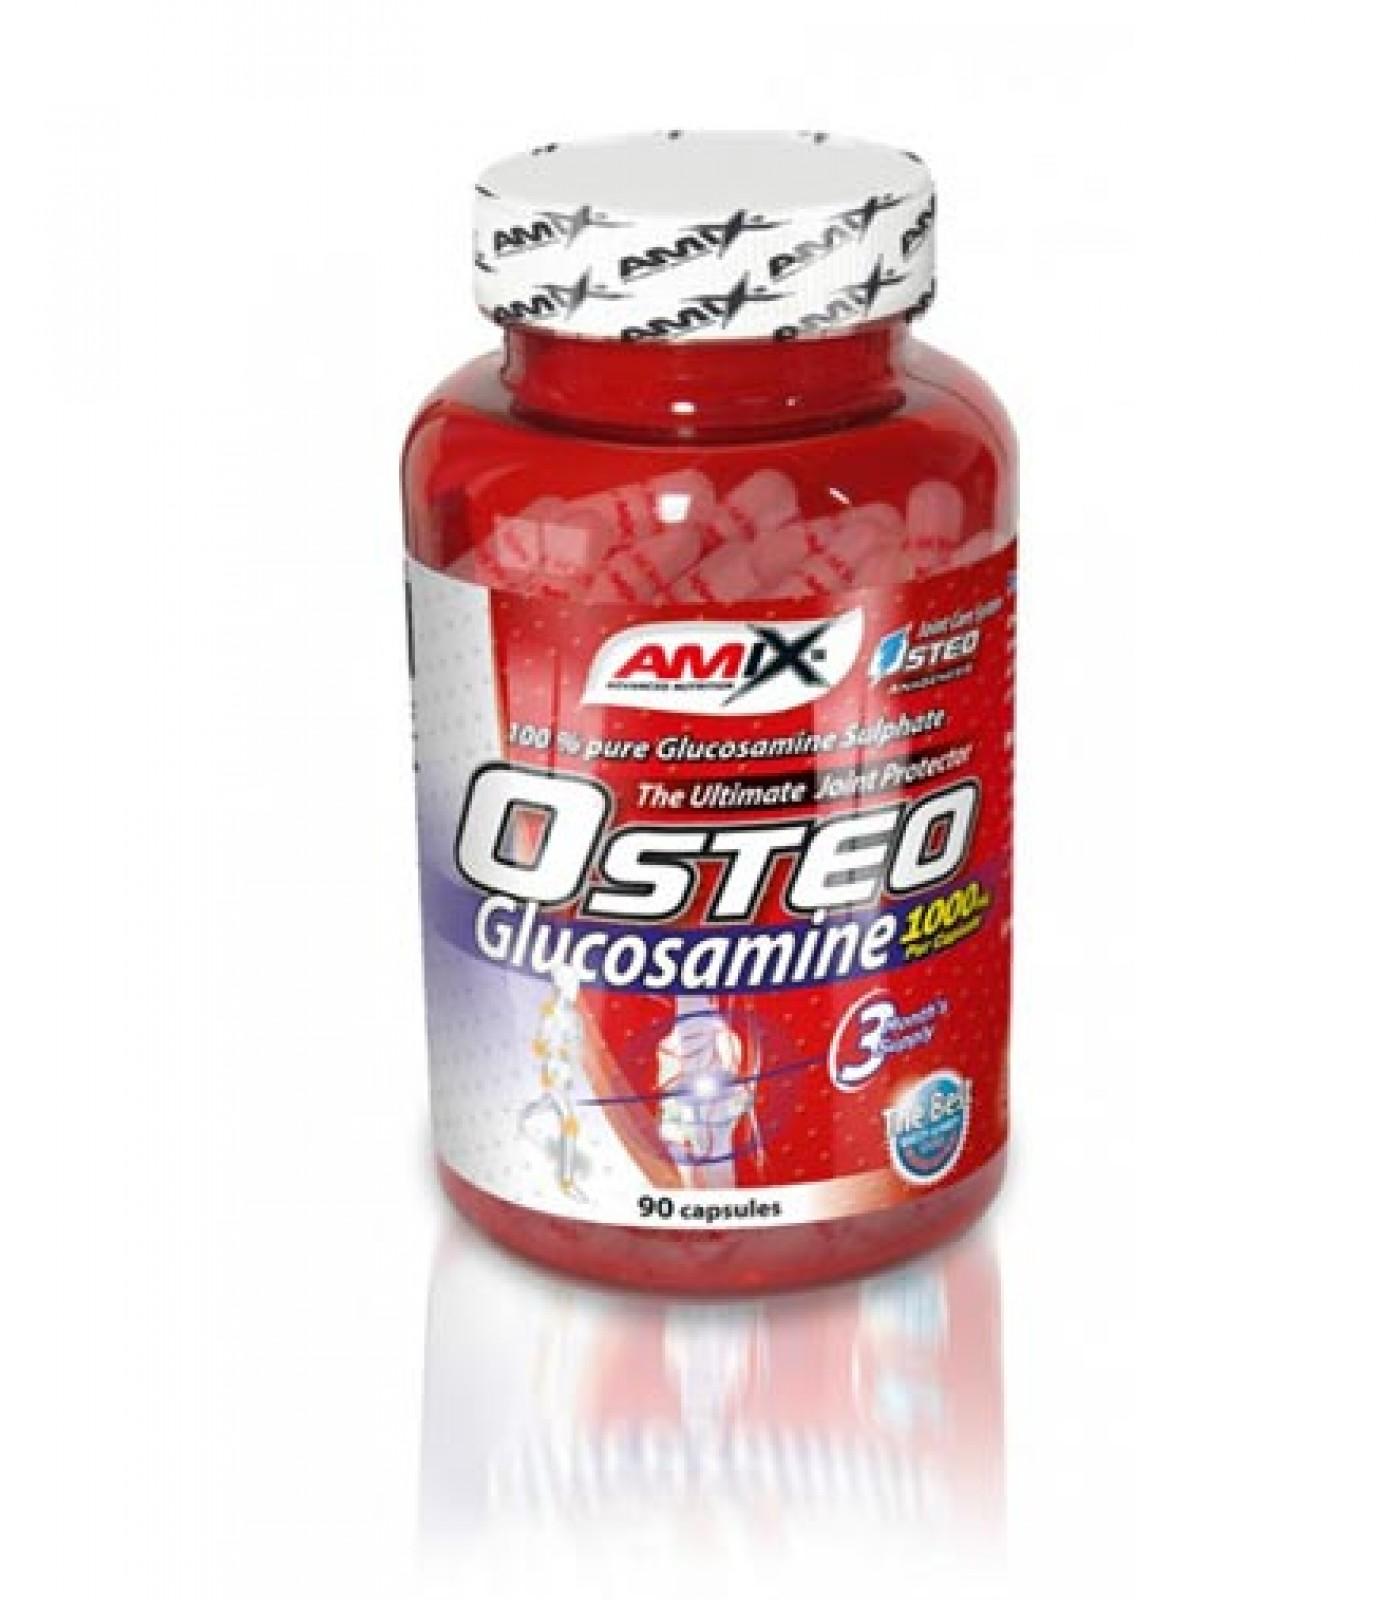 Amix - Osteo Glucosamine / 90 caps.